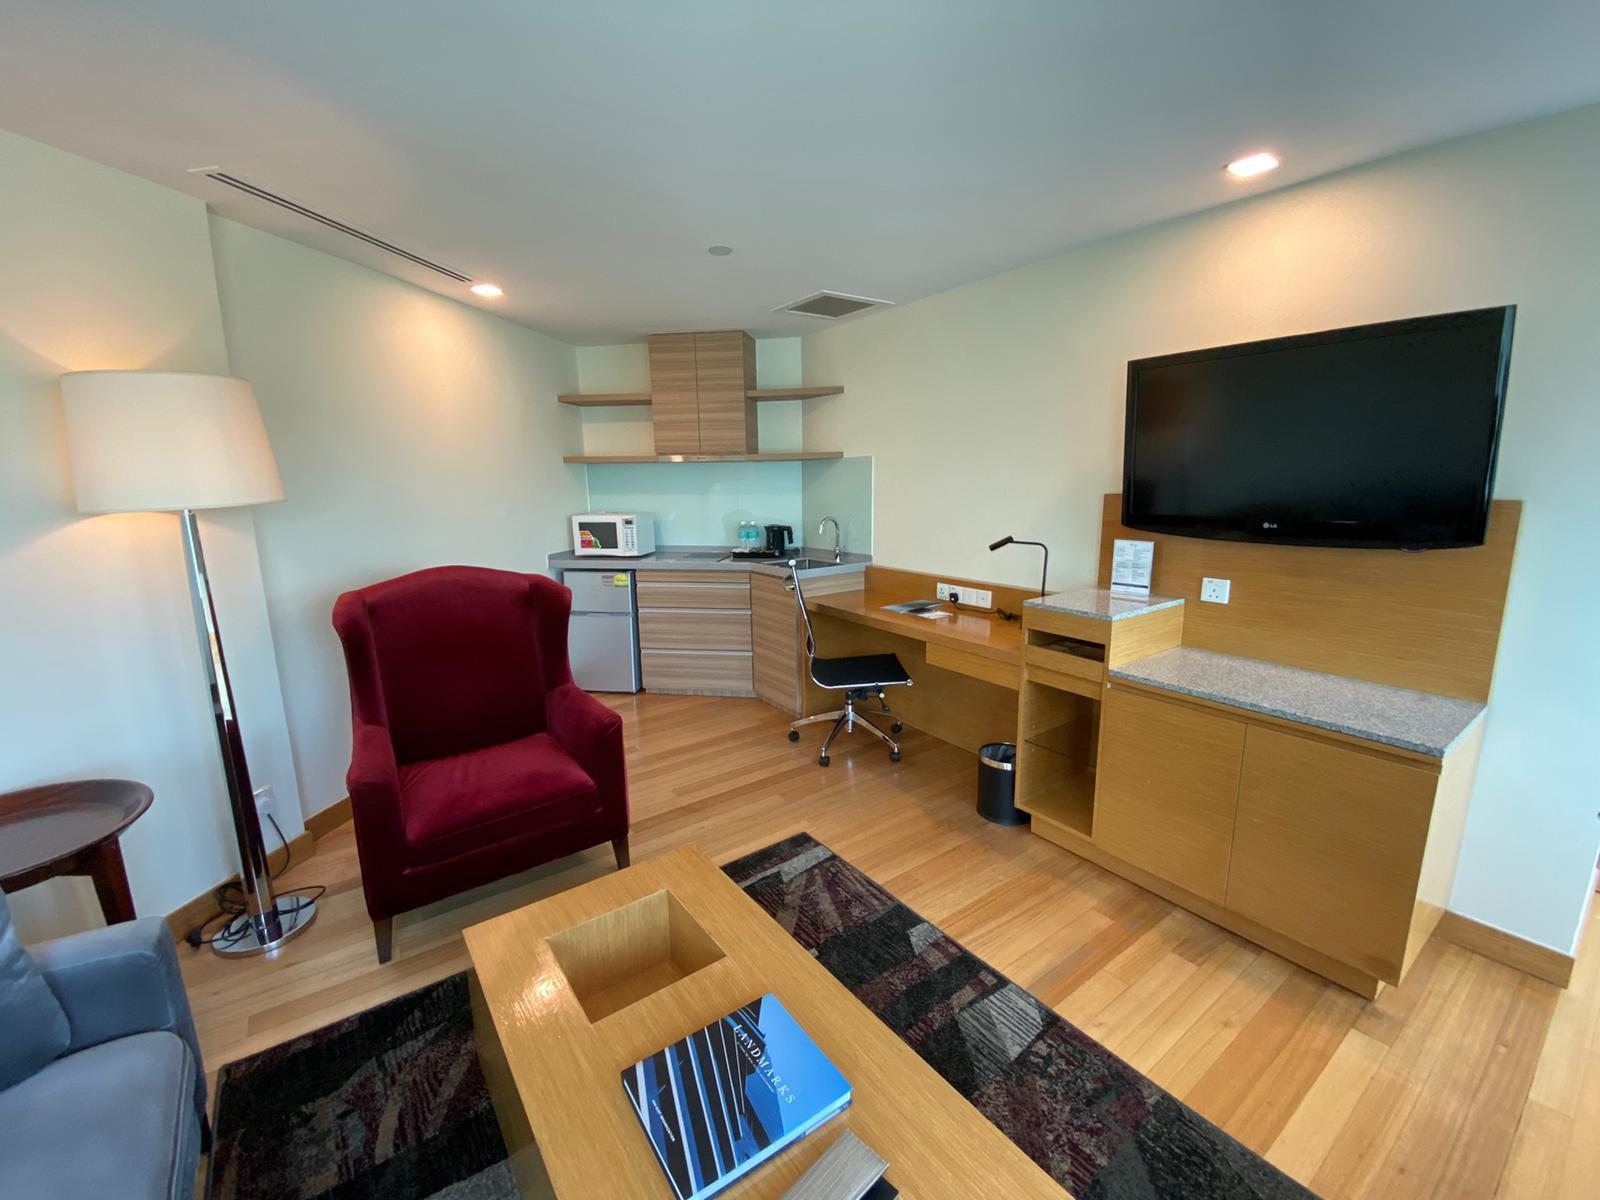 Kitchen at Village Hotel Changi, Loyang, Singapore - Citybase Apartments